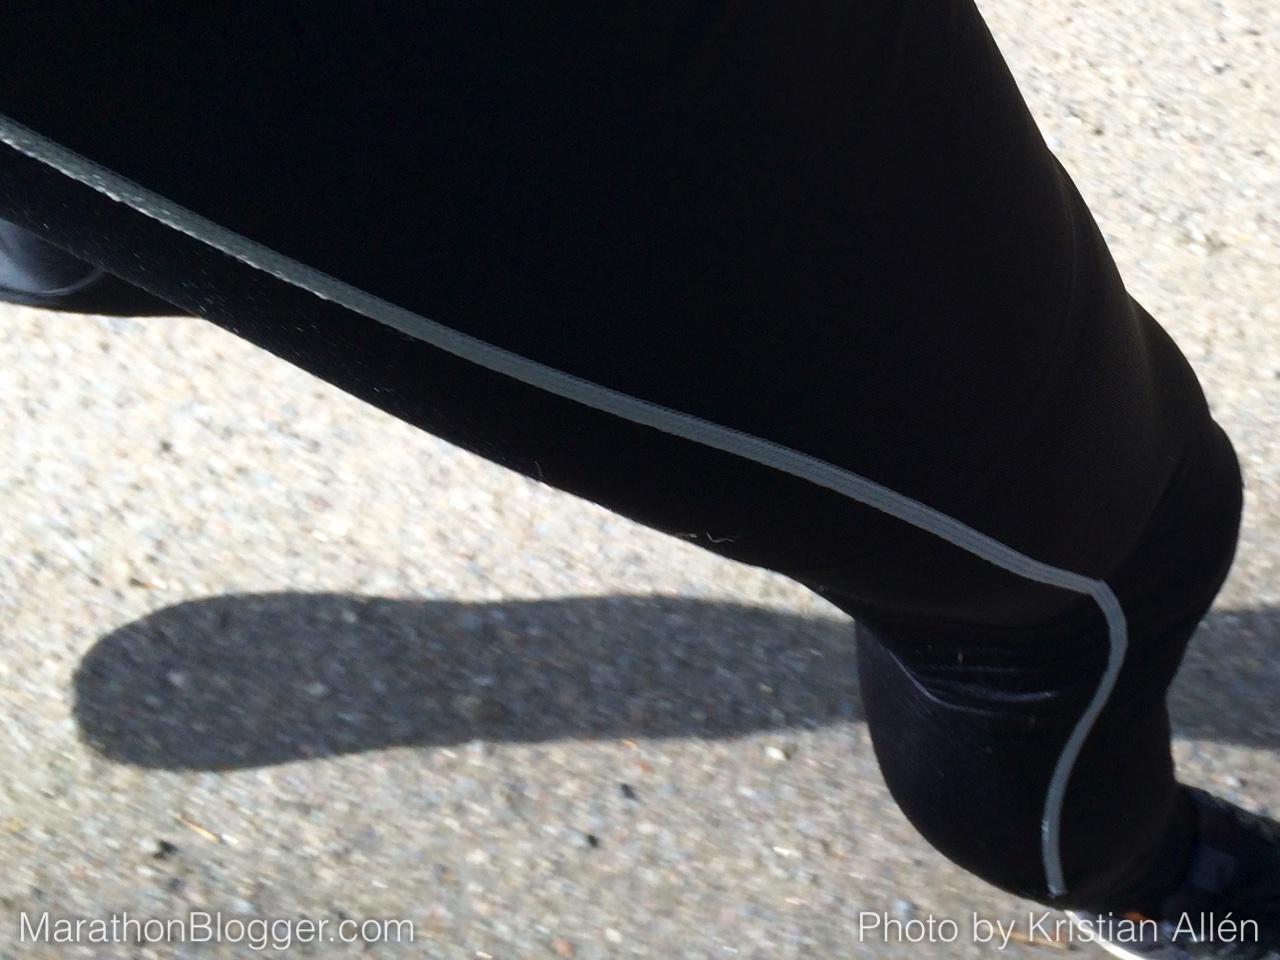 25.5.2015 12.02 km Run